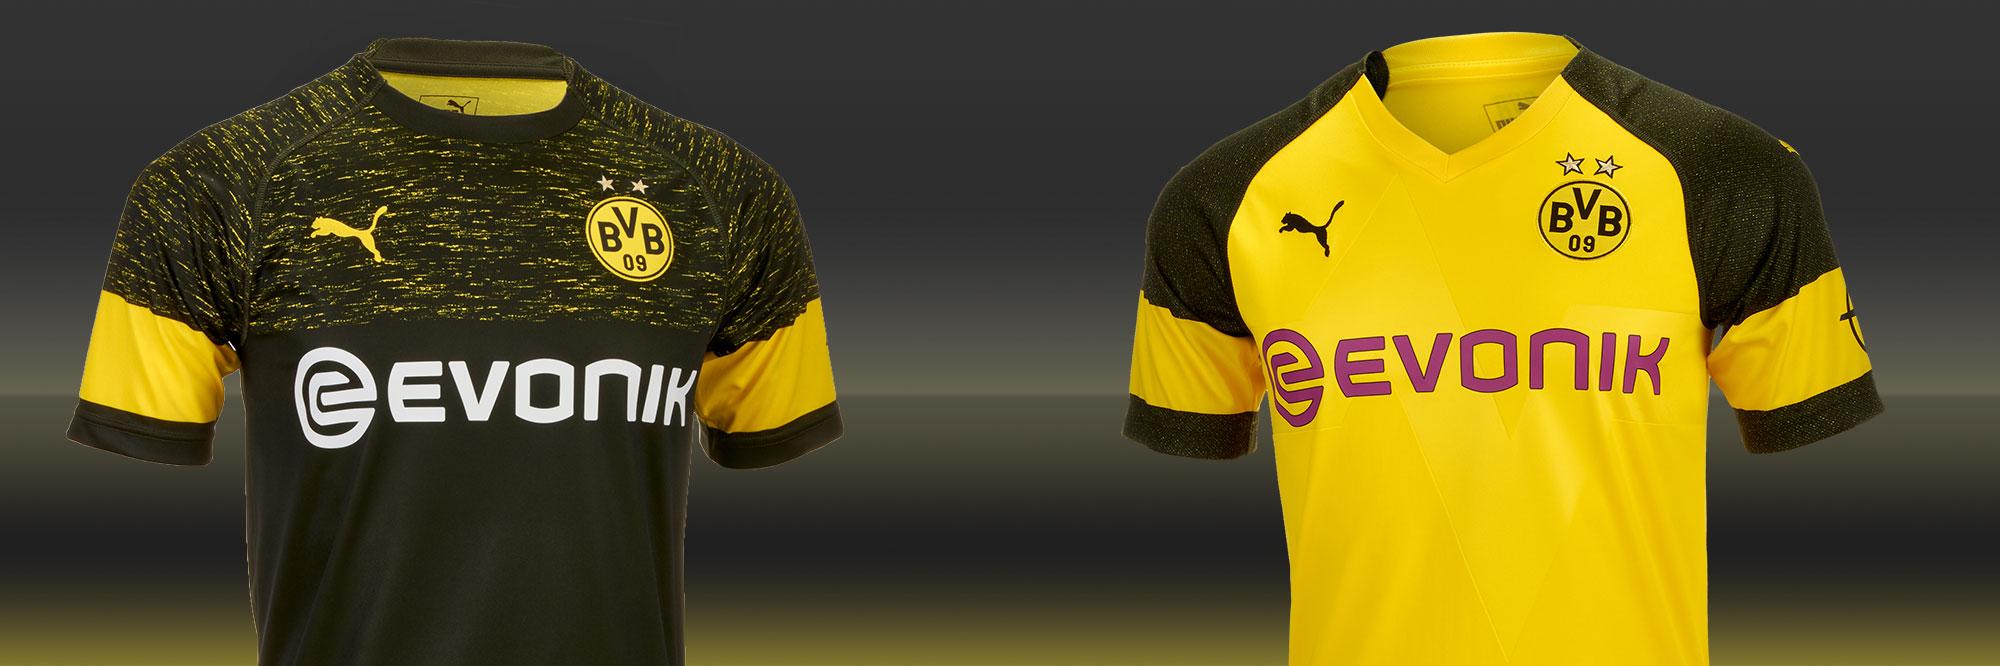 e05fd3e2fc5 Borussia dortmund jersey soccerpro jpg 2000x666 Dortmund 2017 uniforme bvb  09 jer